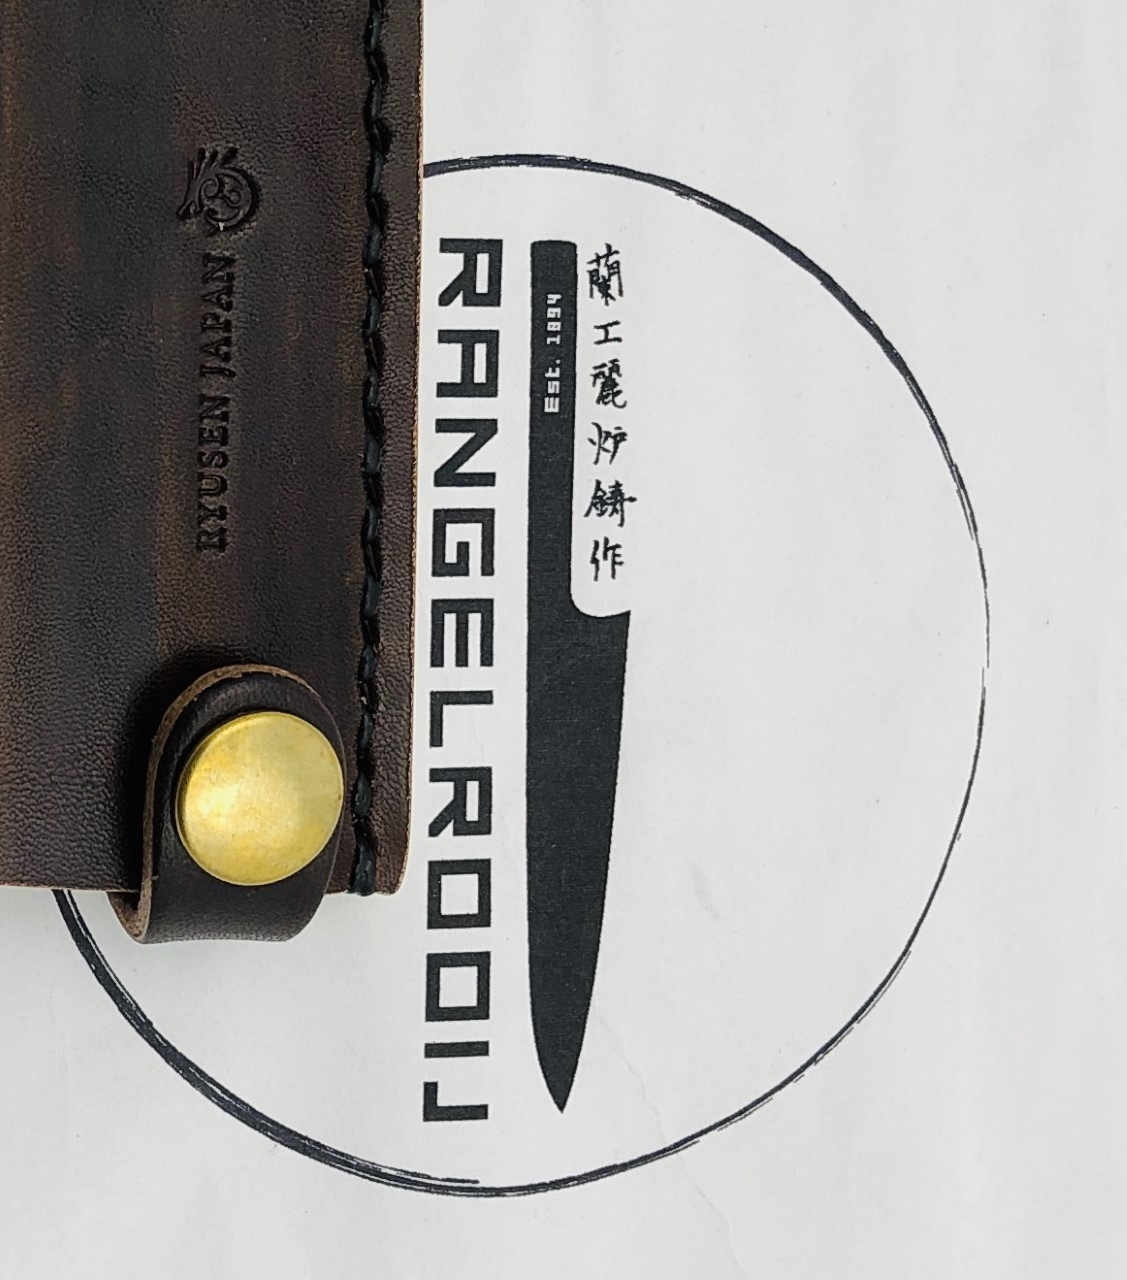 RYUSEN leather sheath LS-201 240 mm gyuto Brown